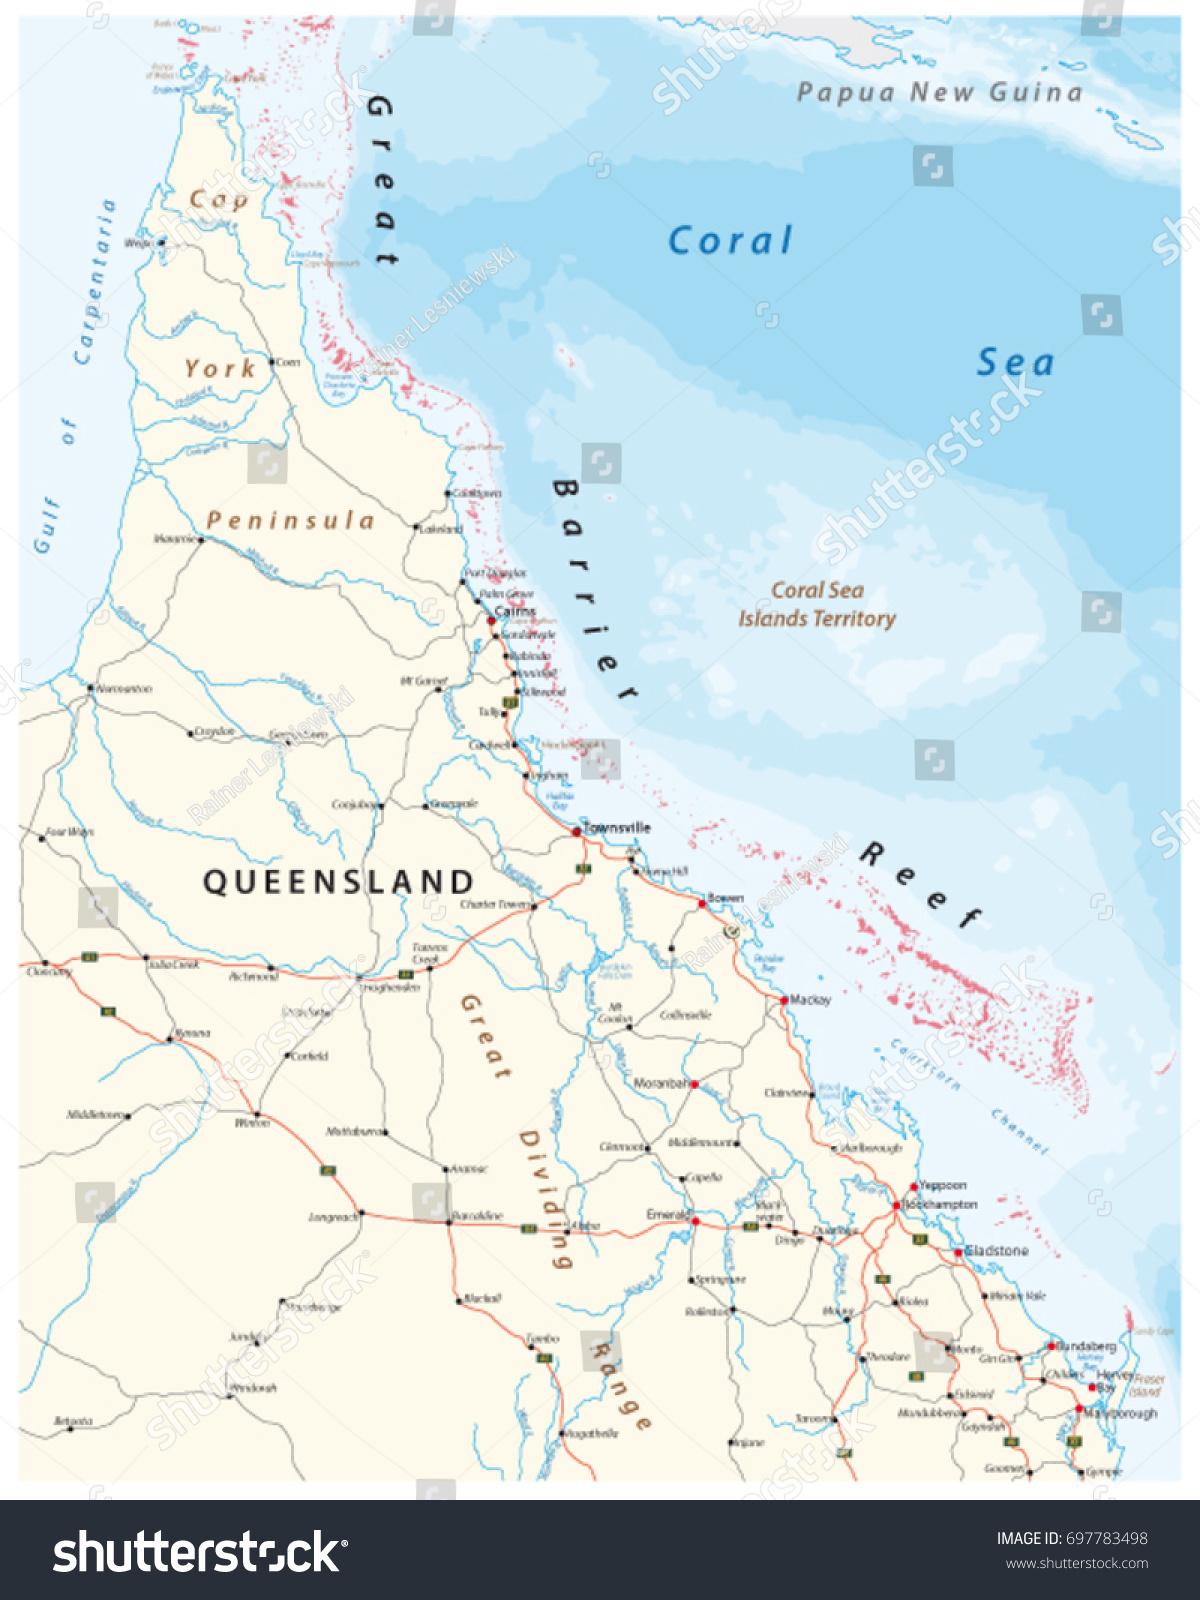 Road Map Cap York Peninsula Great Stock Vector - Detailed map of queensland australia